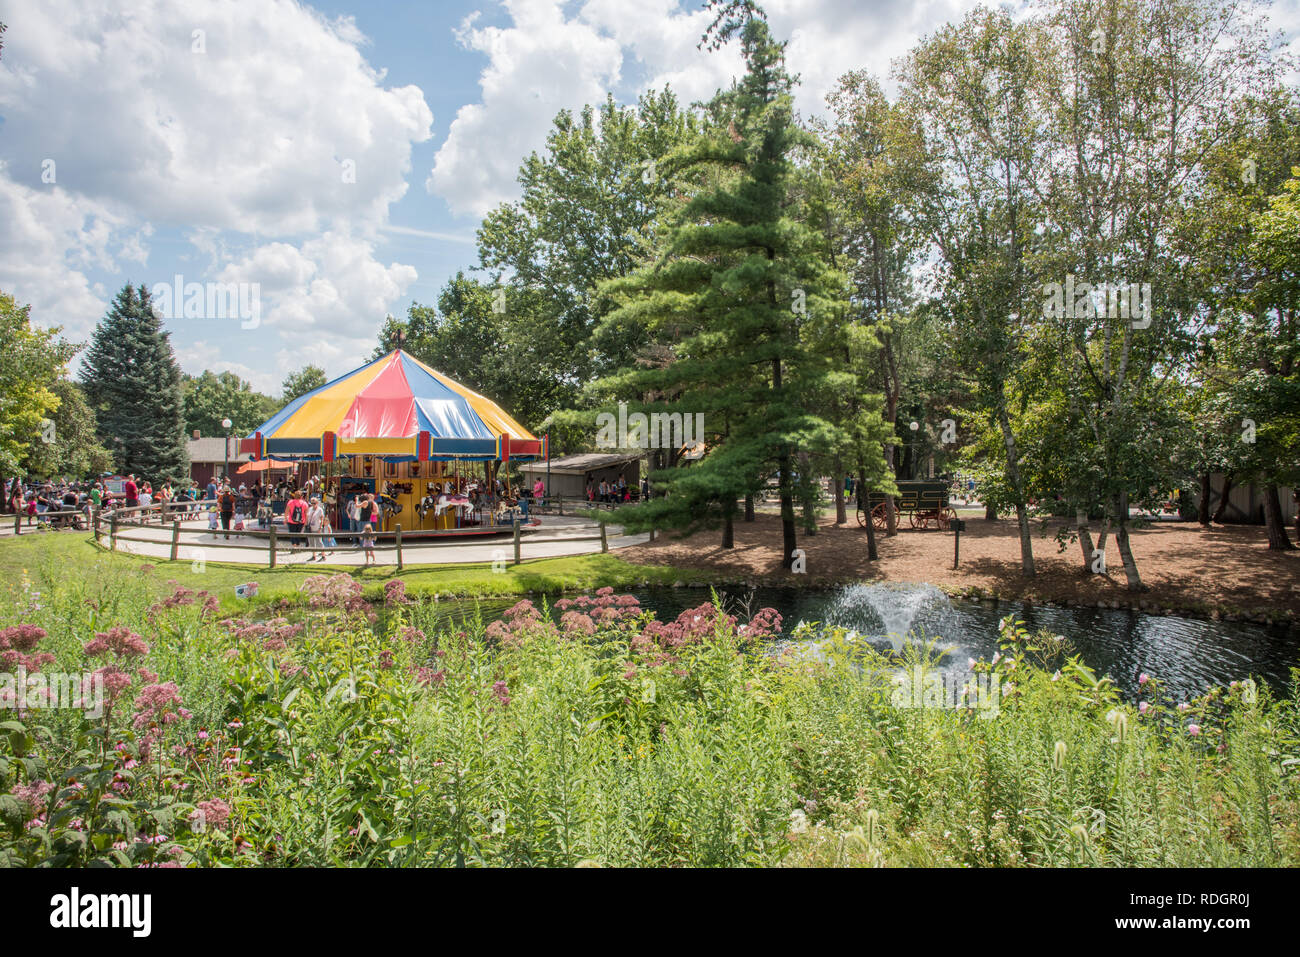 Aurora, Illinois, United States-August 9, 2017: Lush greenery, fountain and people enjoying the carousel ride at Blackberry Farm in Aurora, Illinois - Stock Image